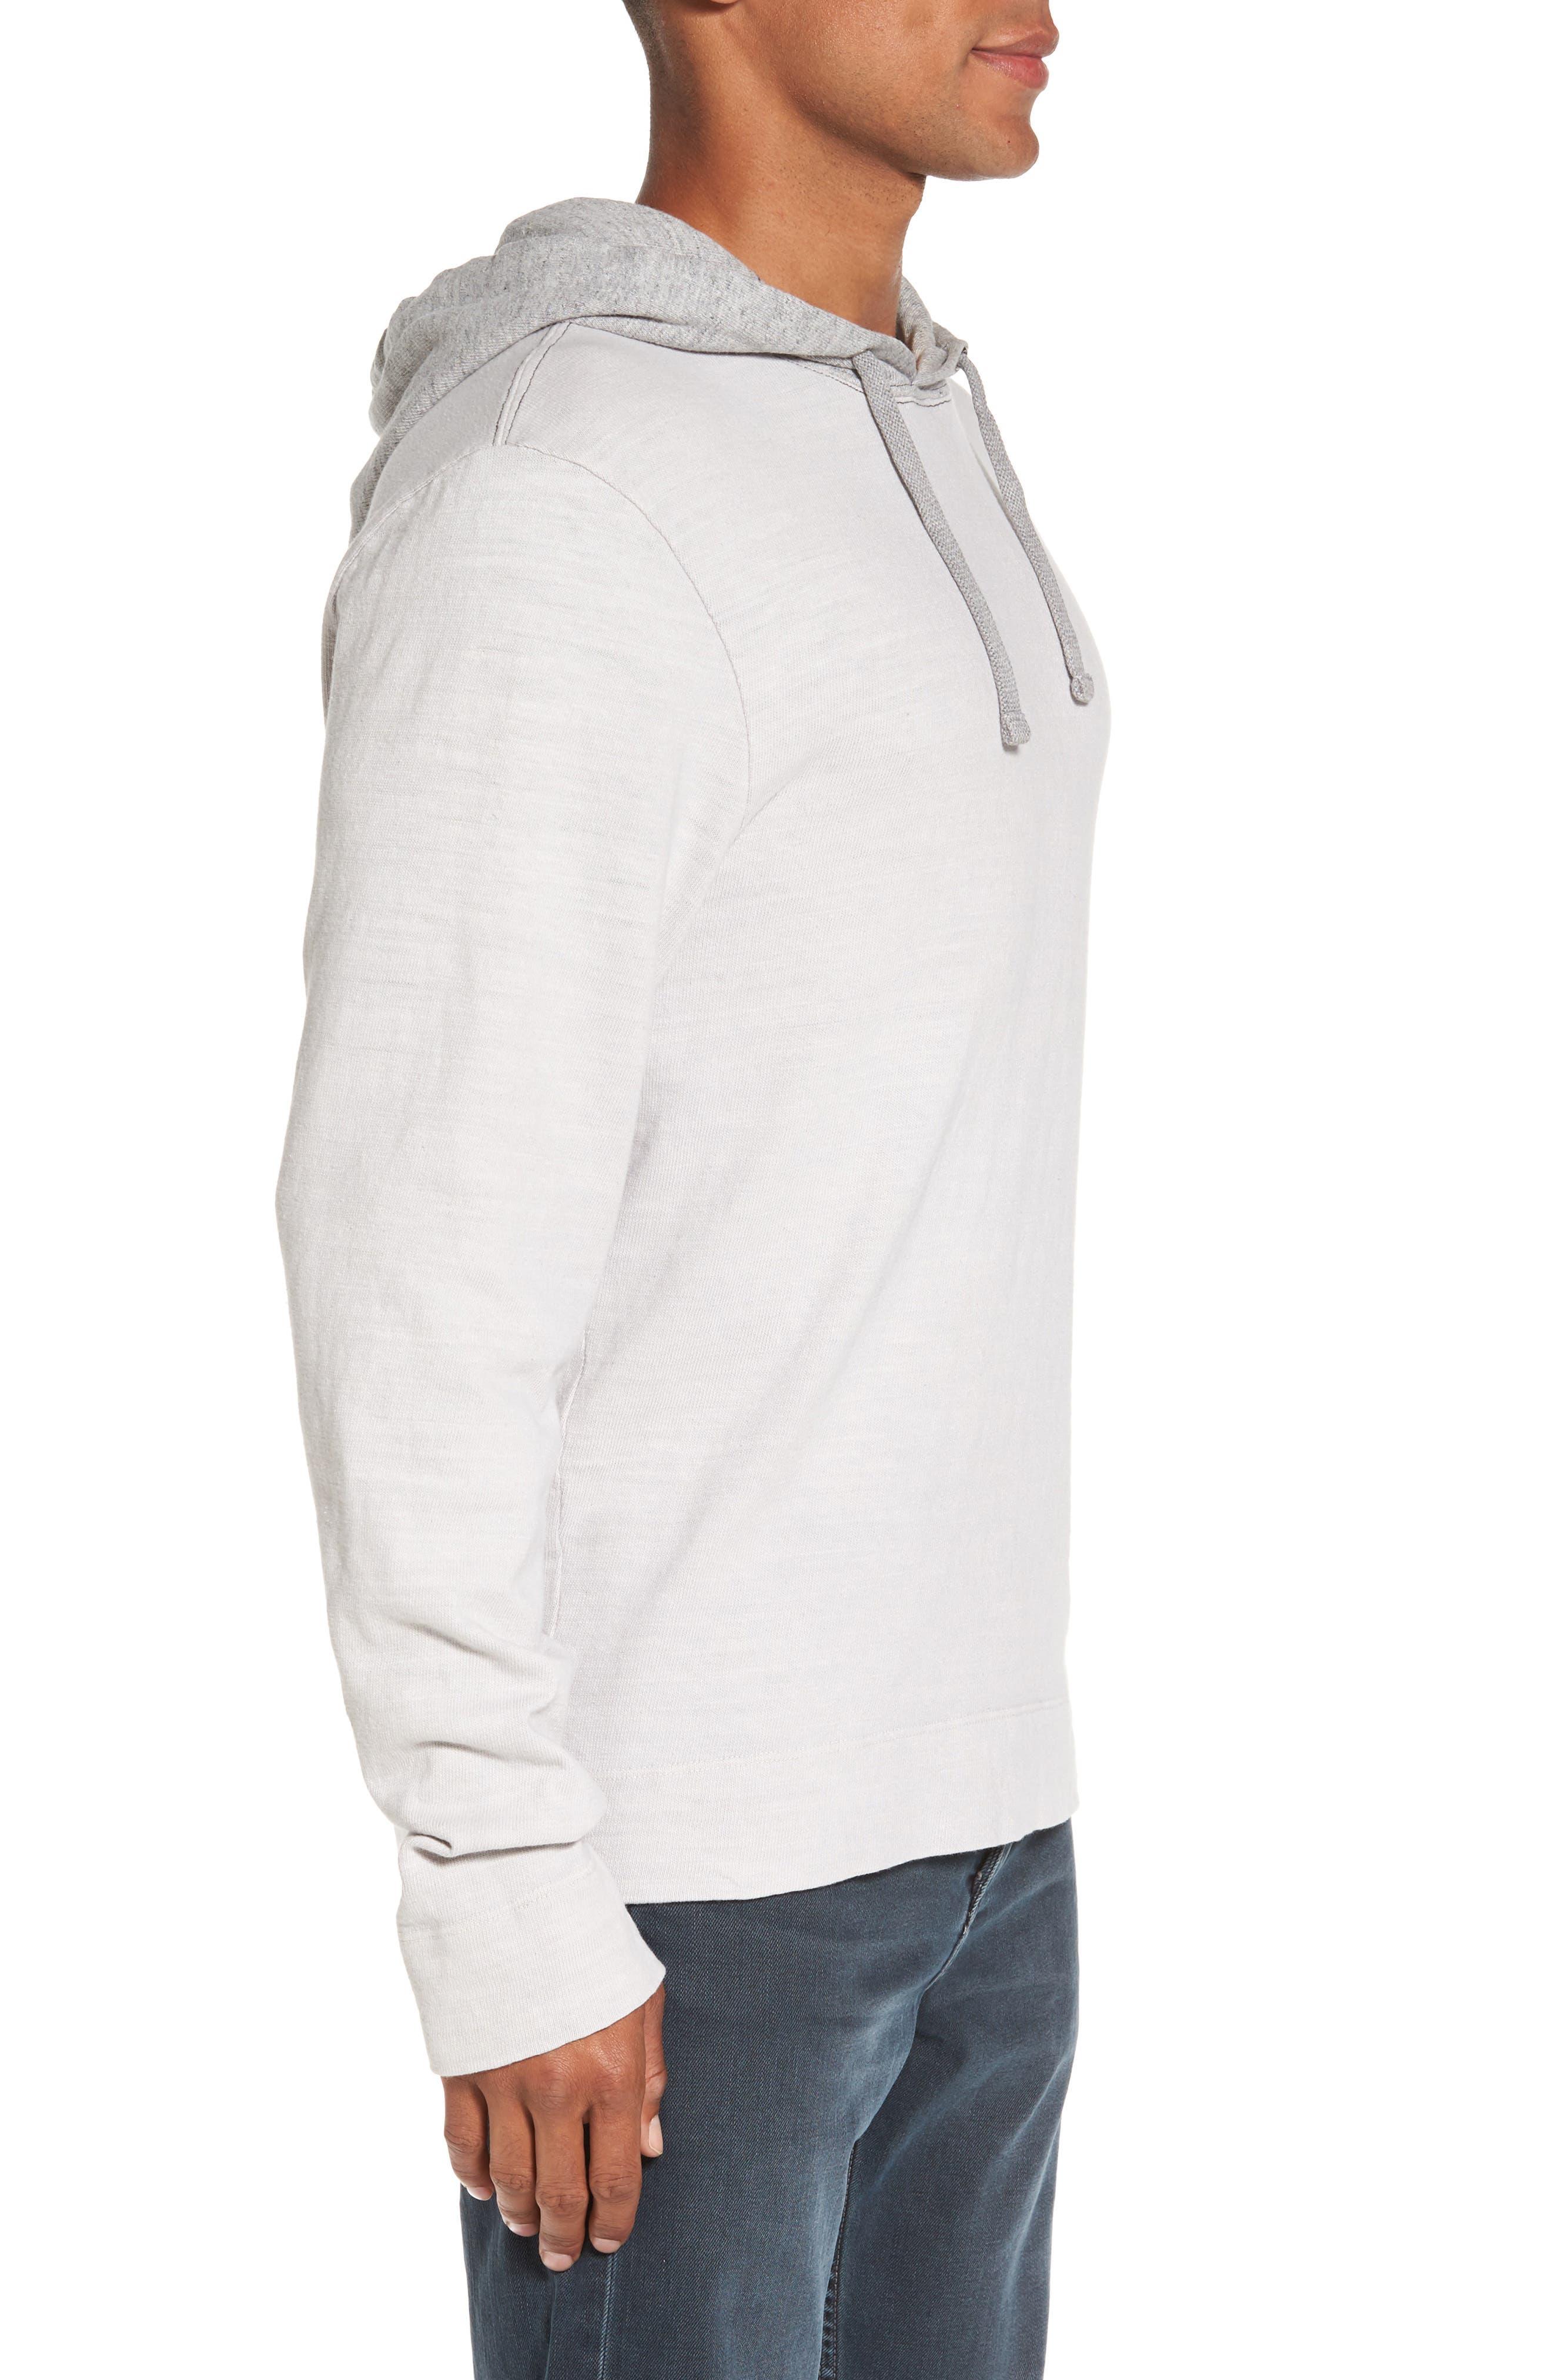 Standard Fit Pullover Hoodie,                             Alternate thumbnail 3, color,                             Concrete Dust Pigment